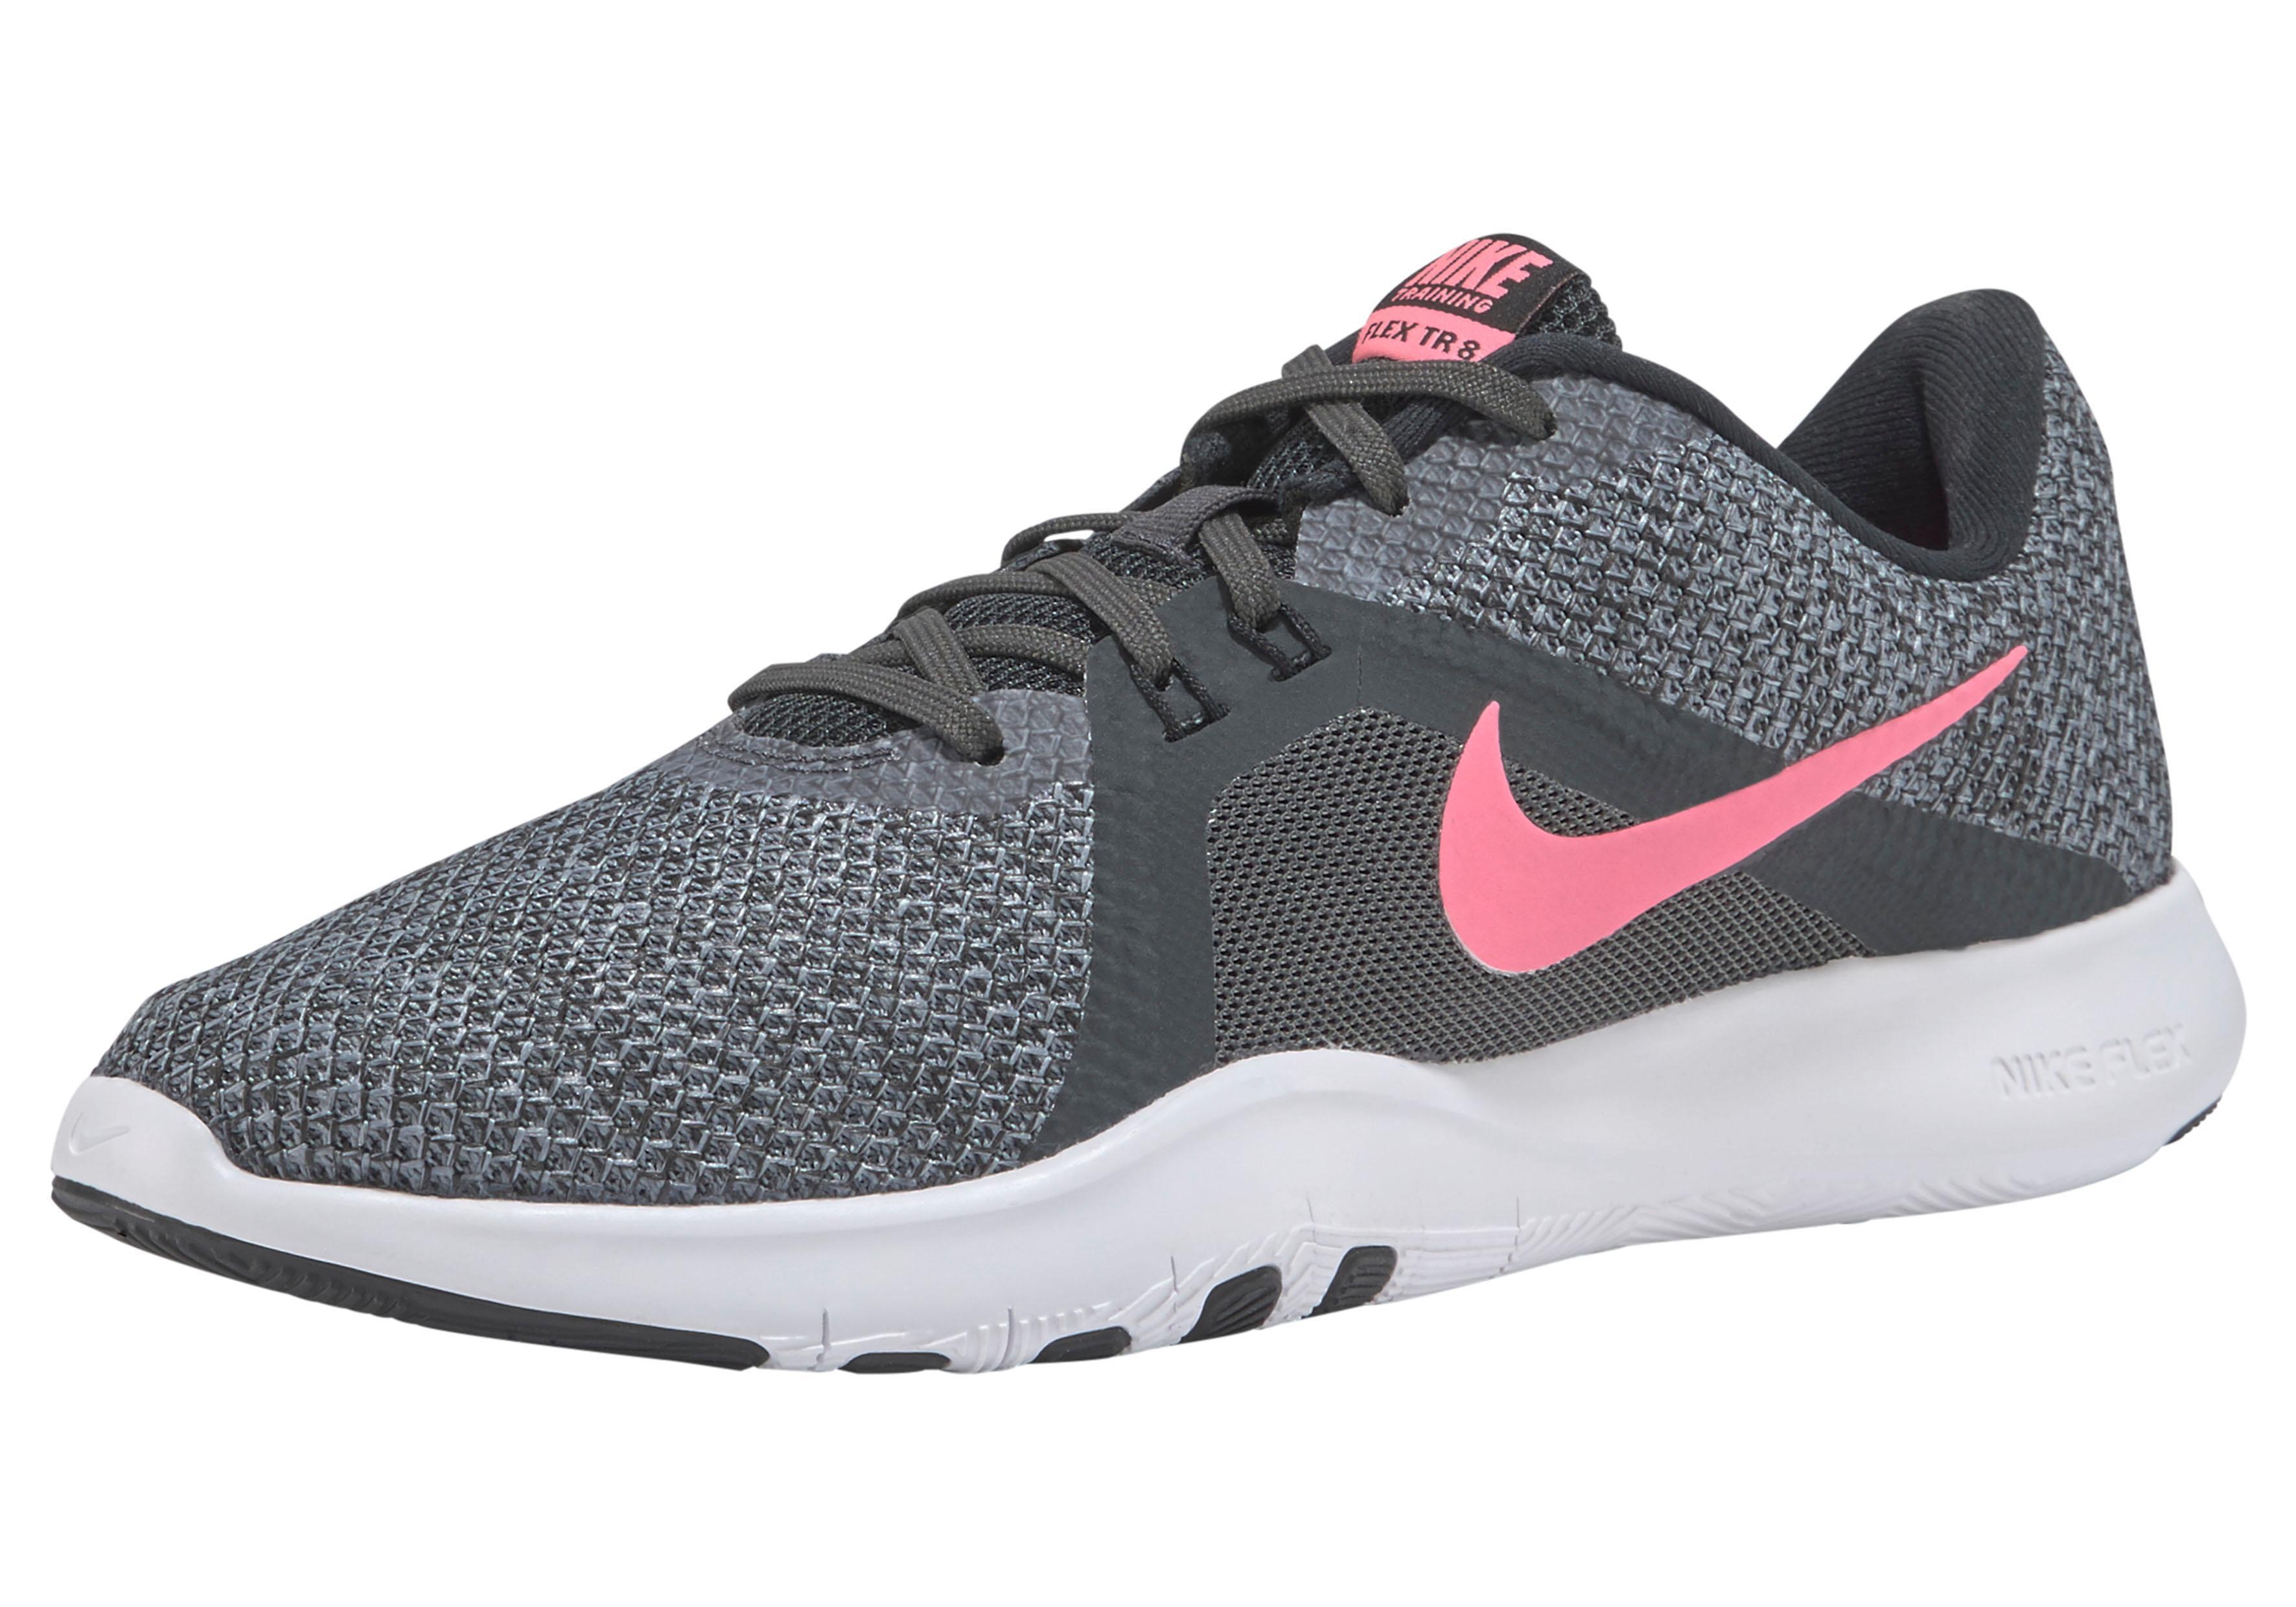 Nike Fitnessschuh Wmns Flex Trainer 8